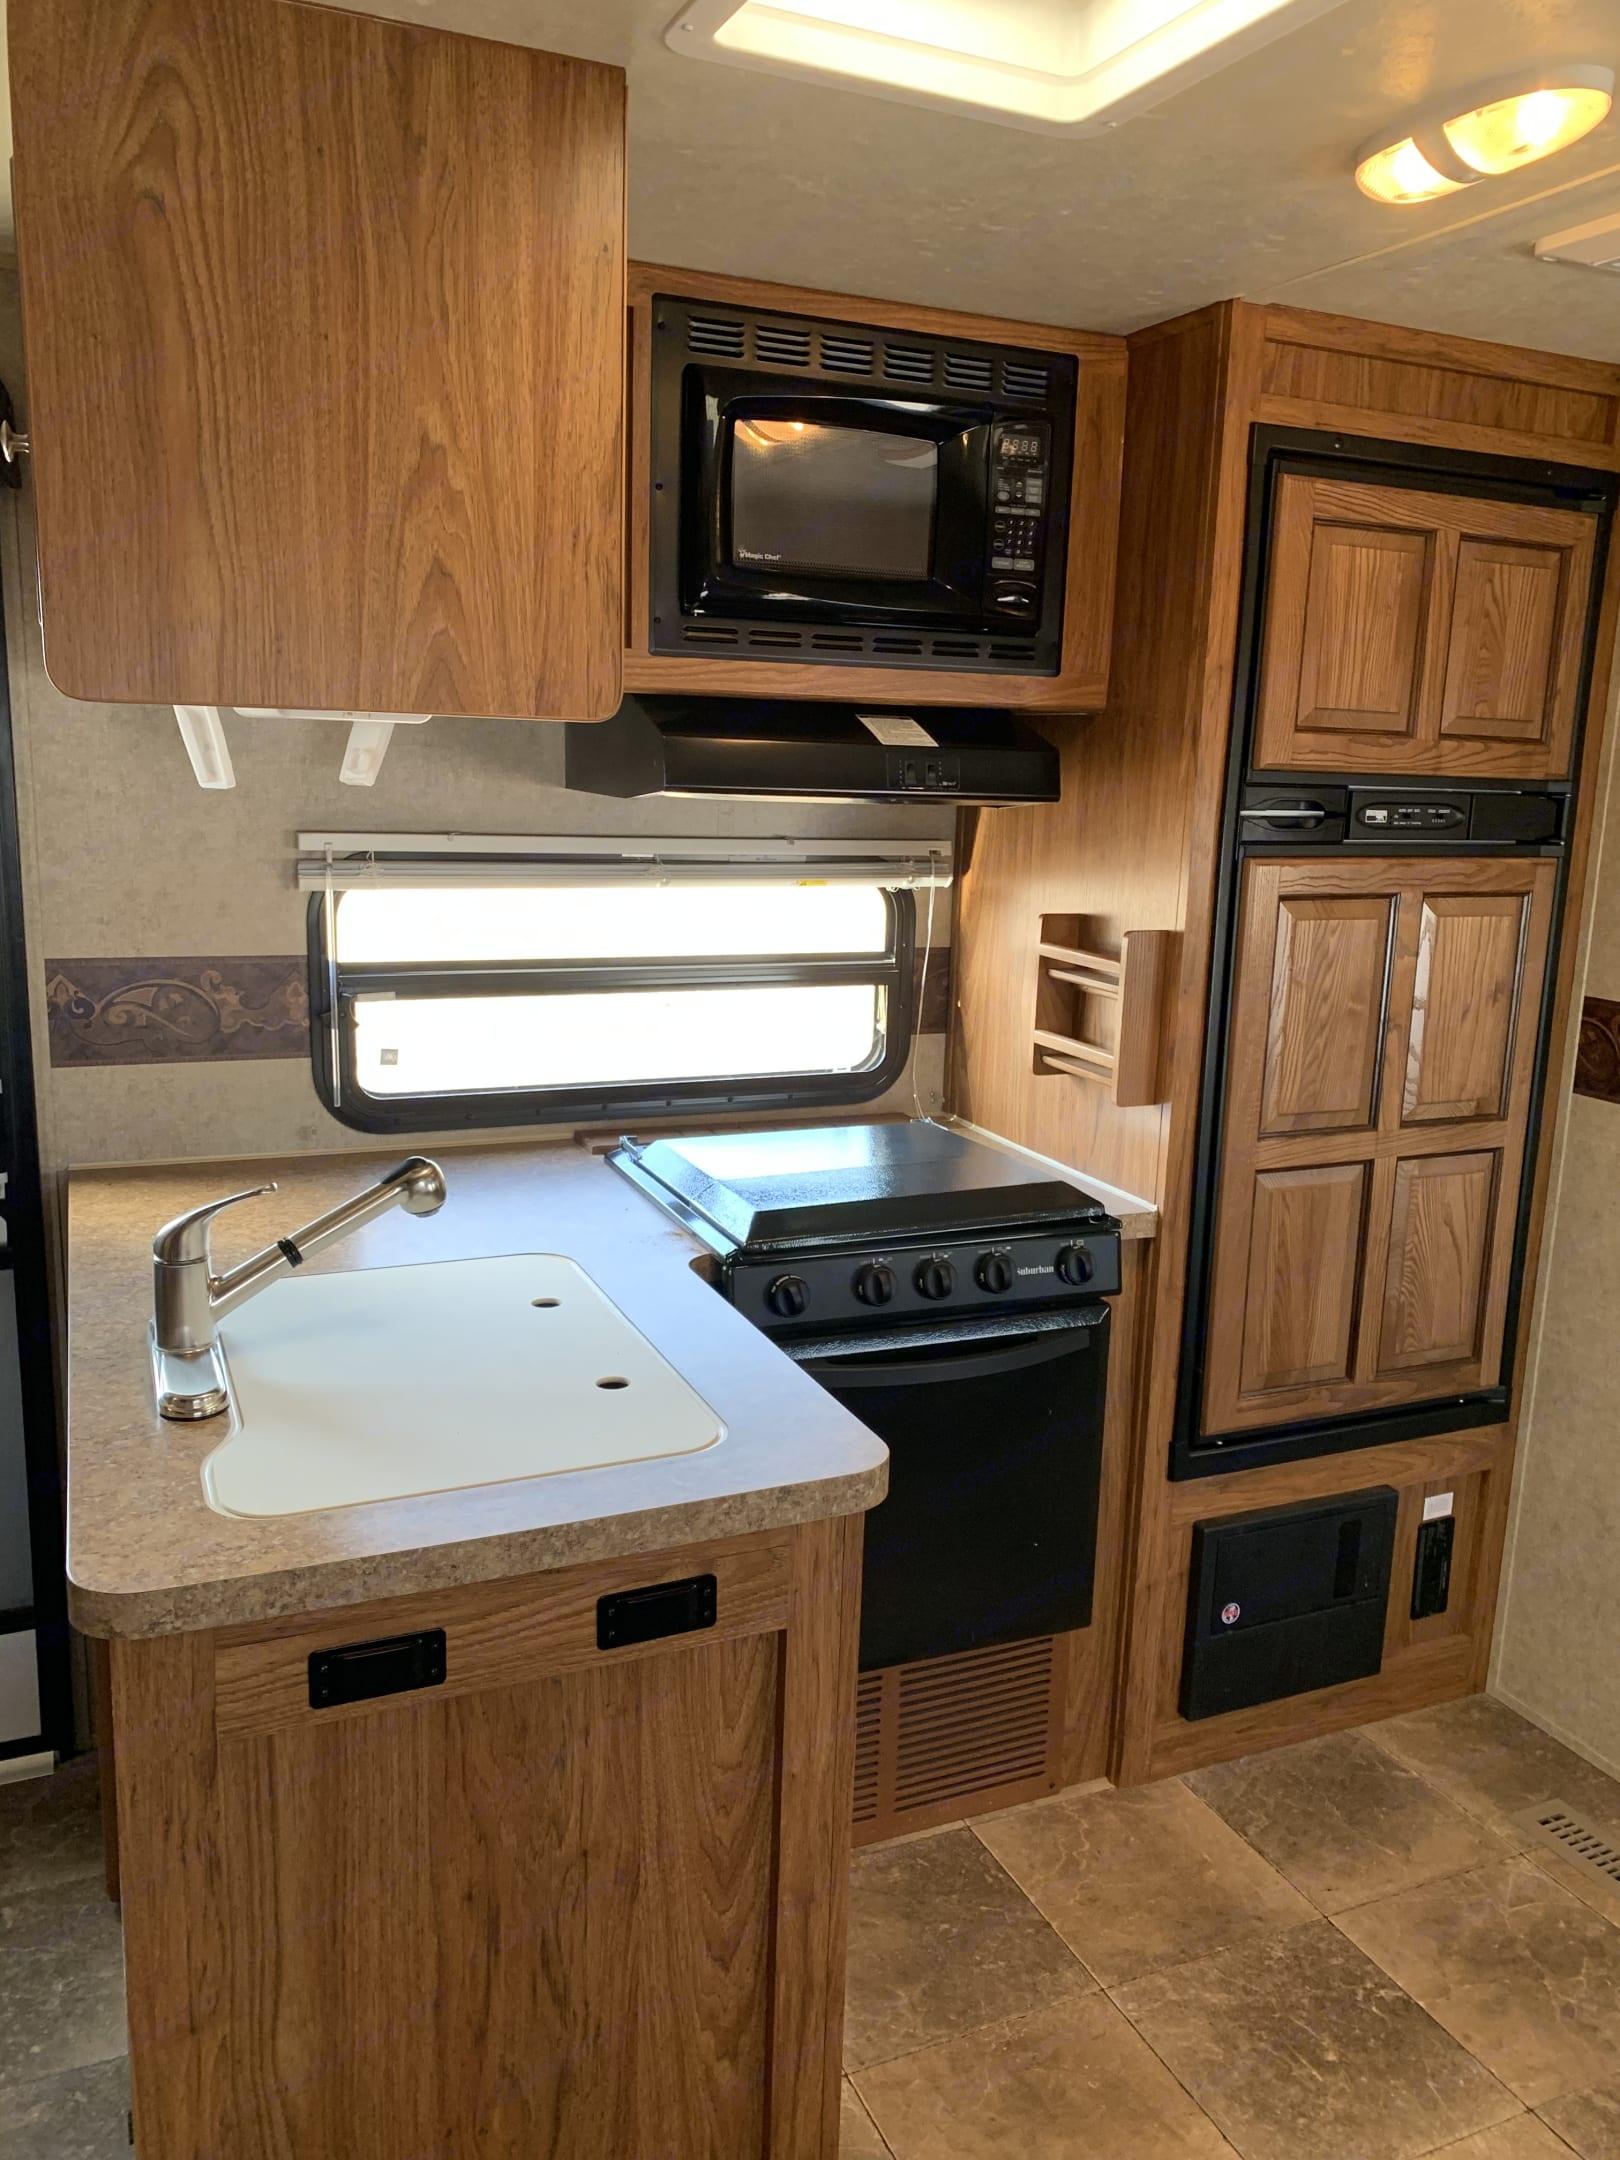 Fully stocked kitchen . Forest River Rockwood Windjammer 2013